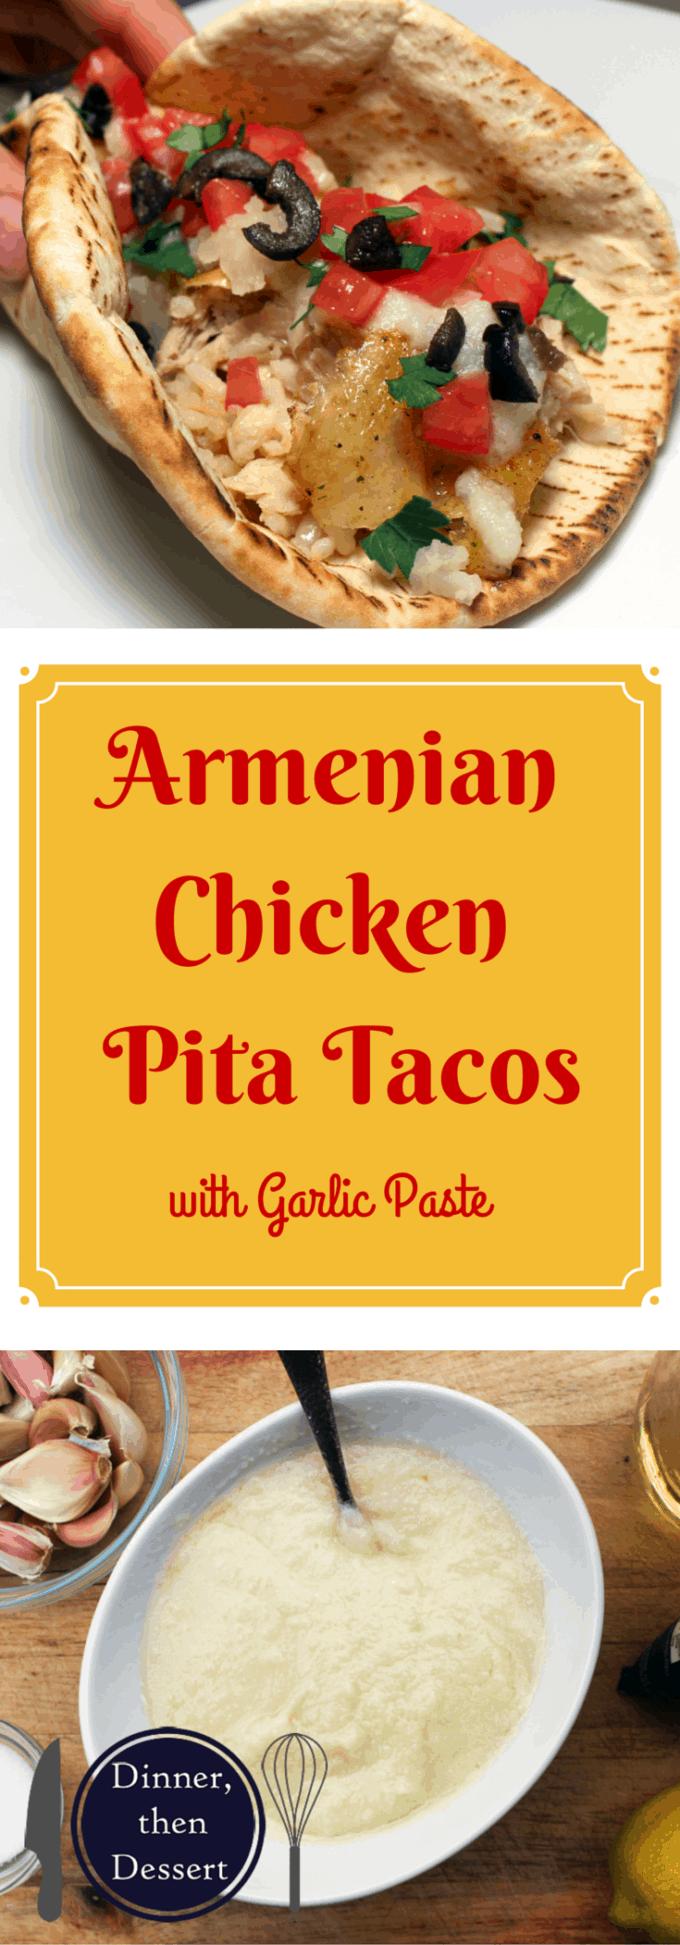 Armenian Garlic Rotisserie Chicken Pita Tacos Are Delicious Crispy Chicken In Pita Bread With Garlic Paste